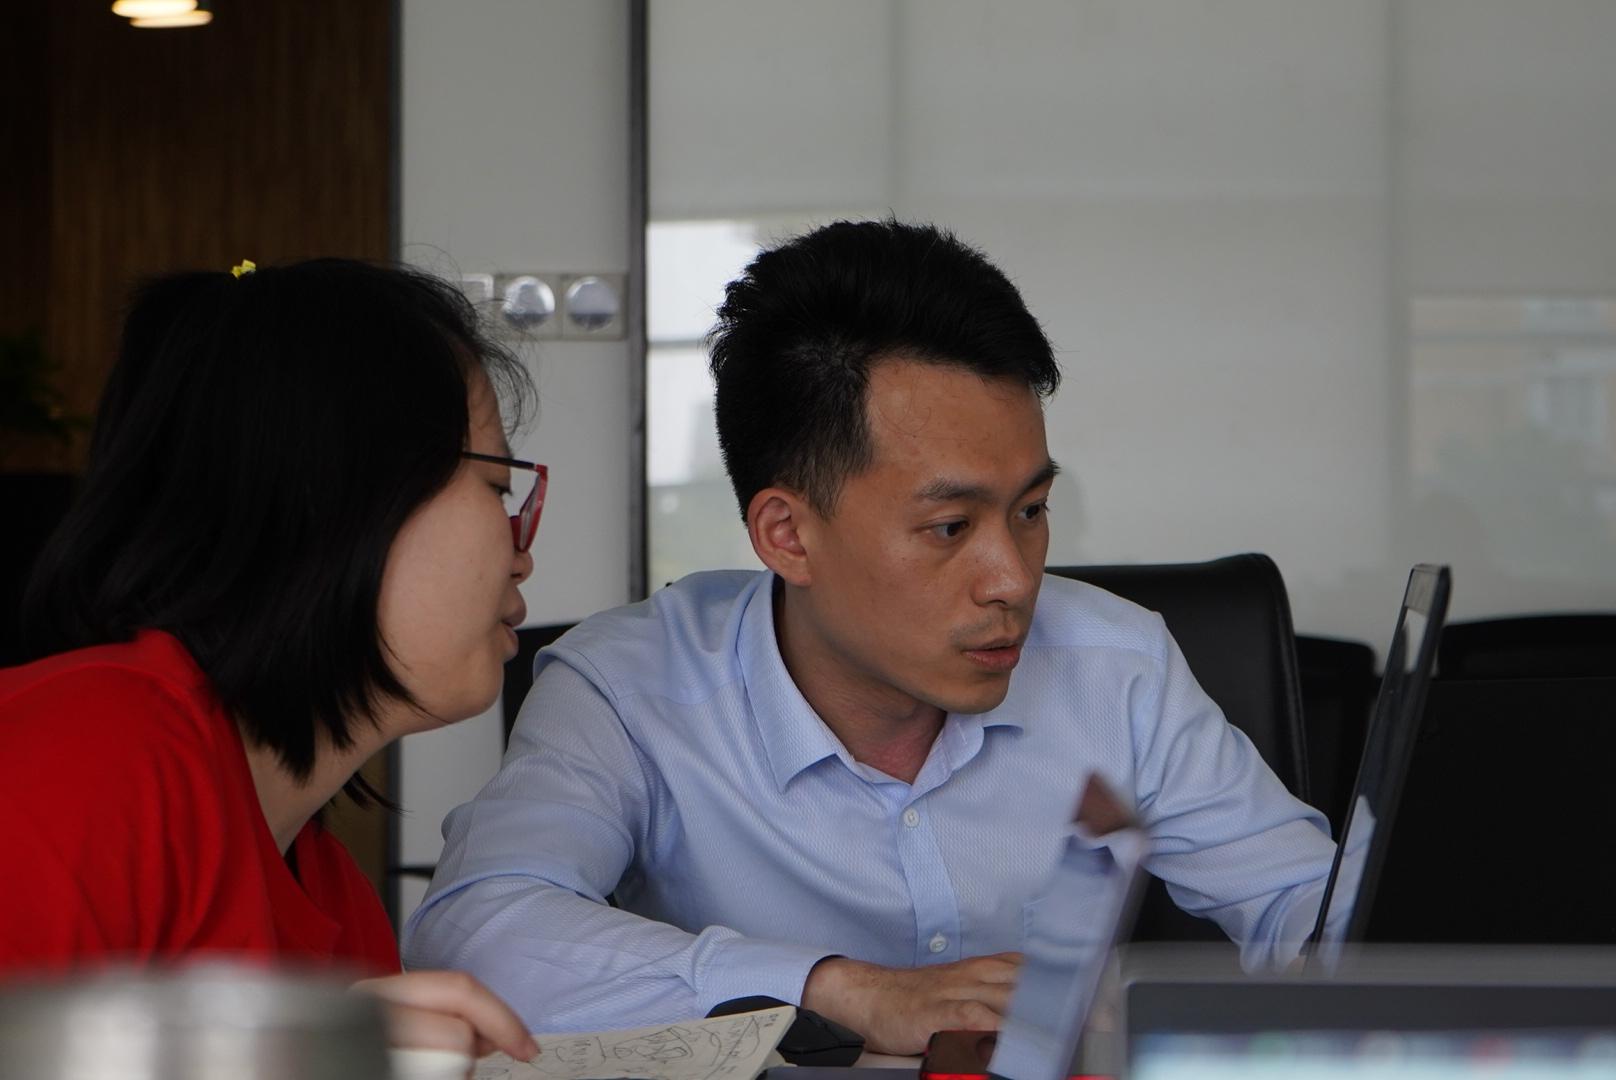 iS-RPA 技术认证培训 - 上海 20190605 班 - 培训开始